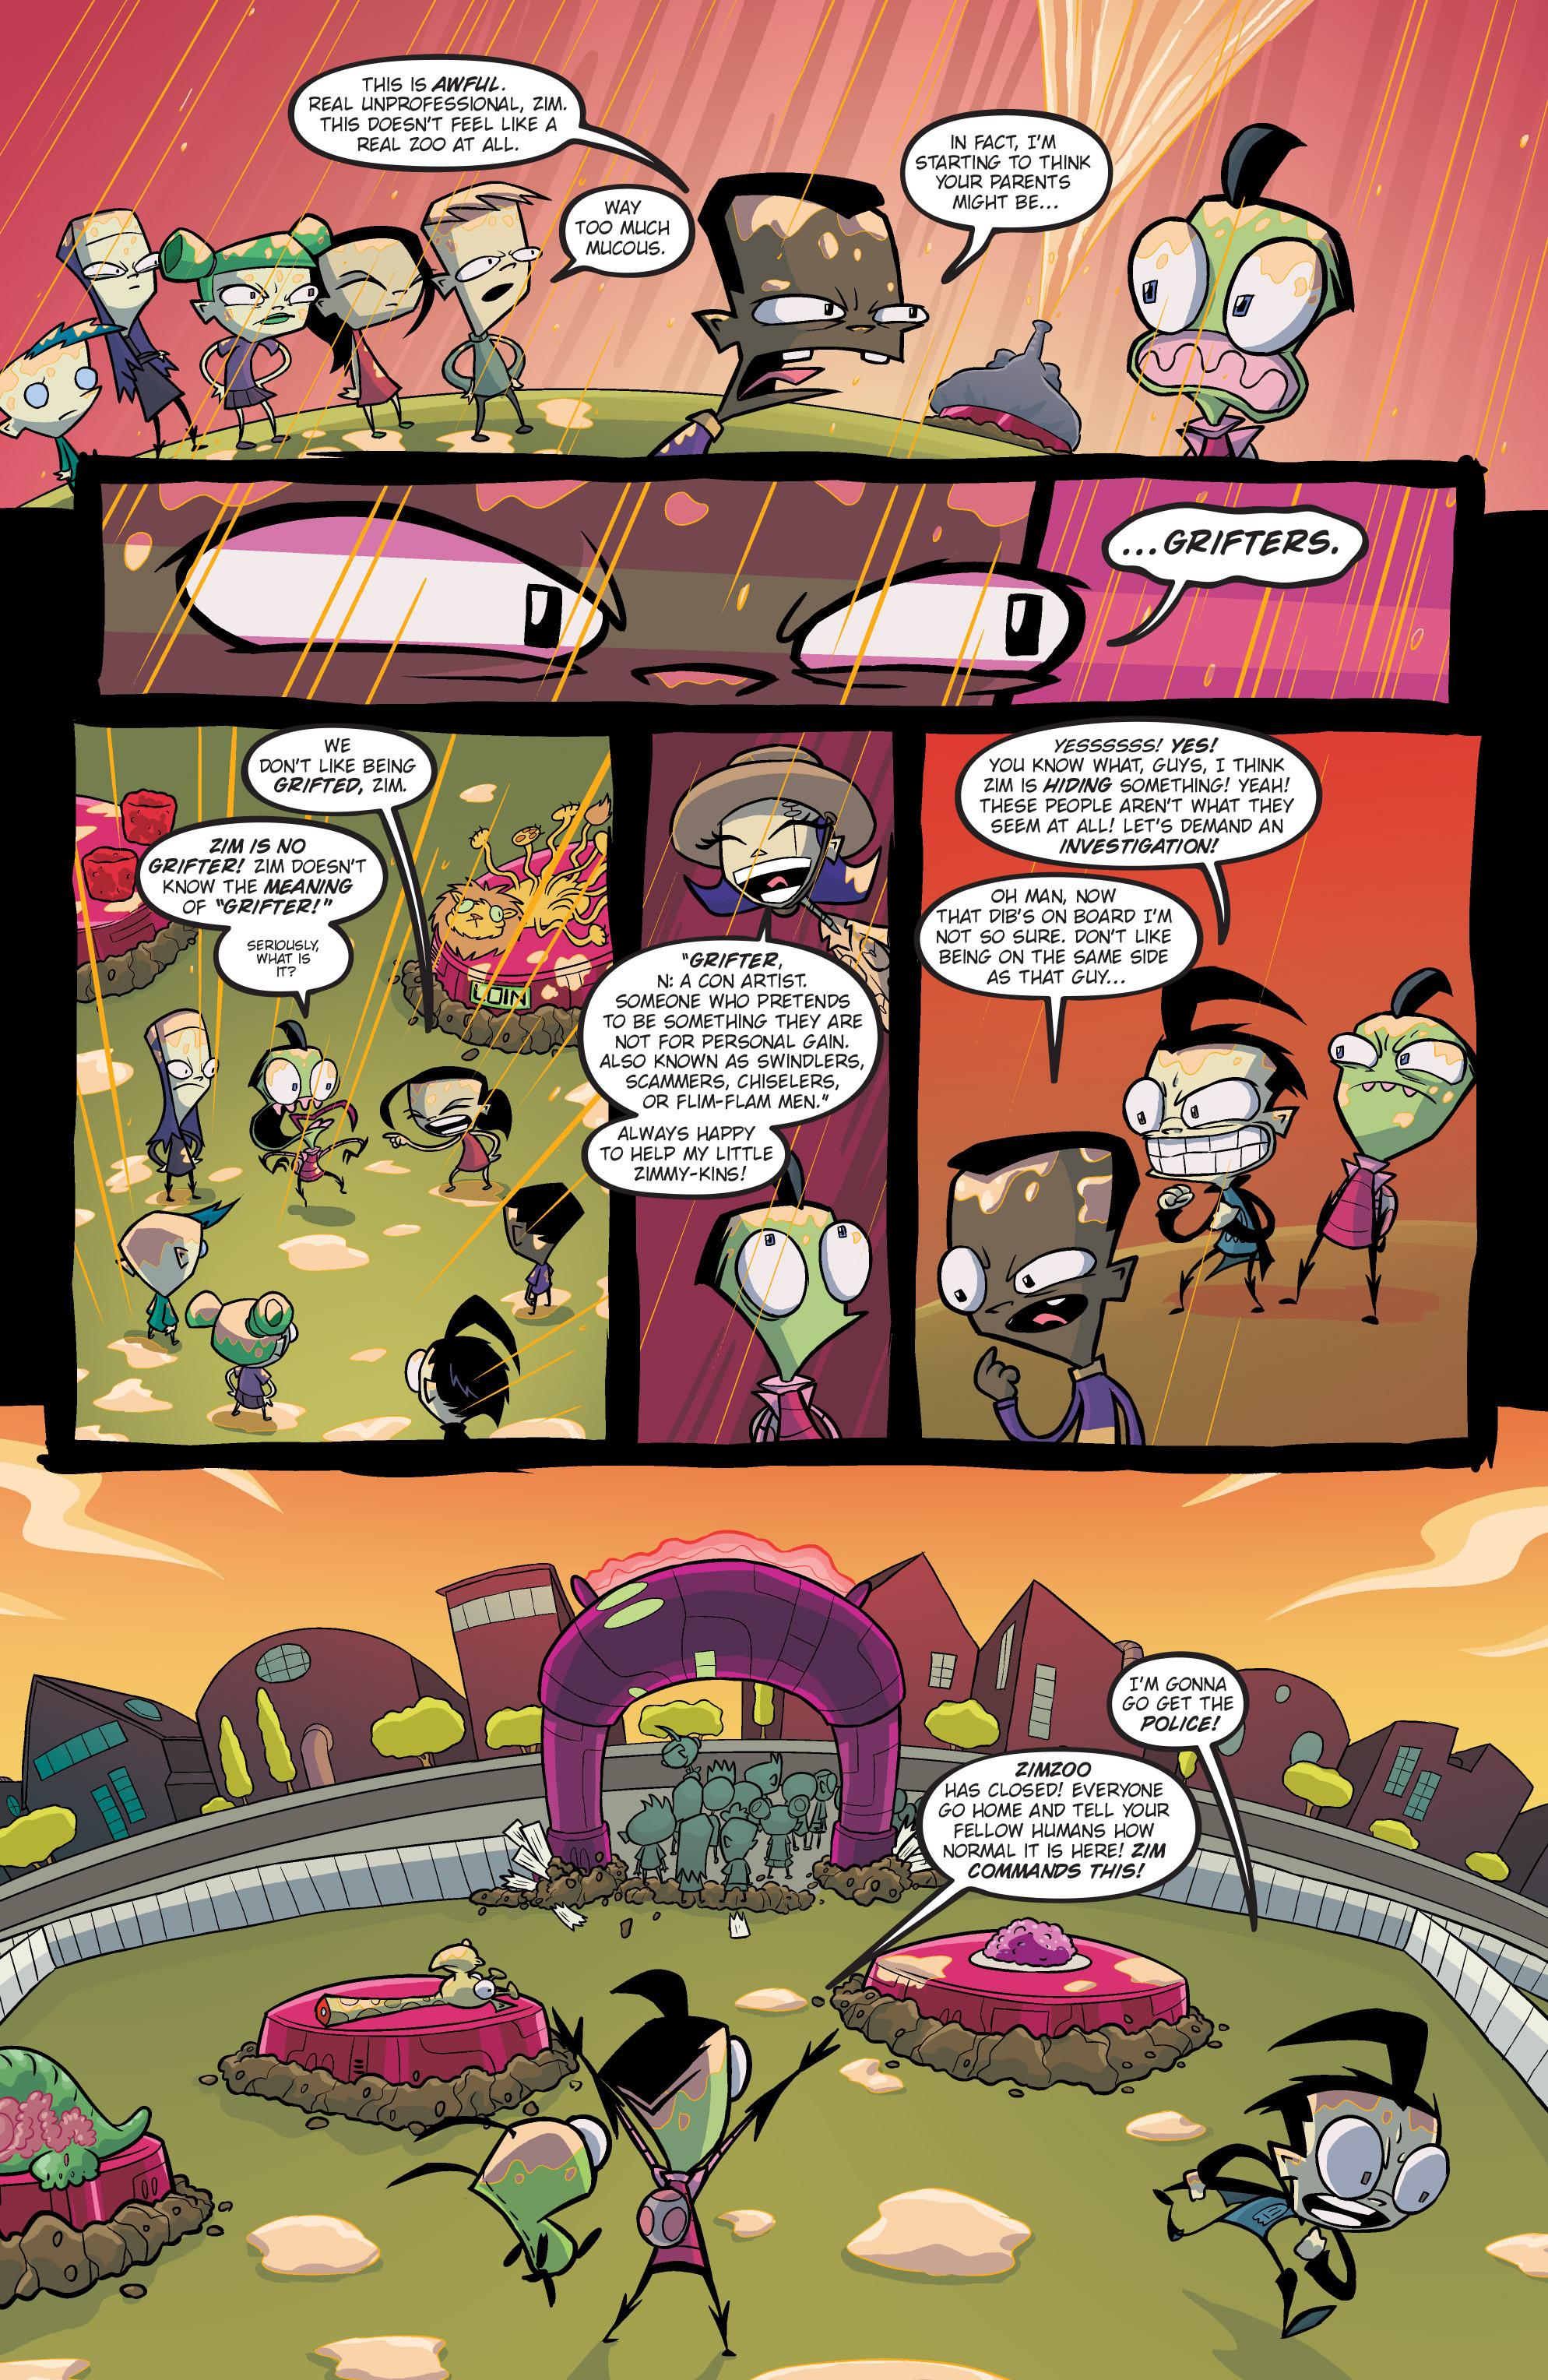 Read online Invader Zim comic -  Issue #19 - 11